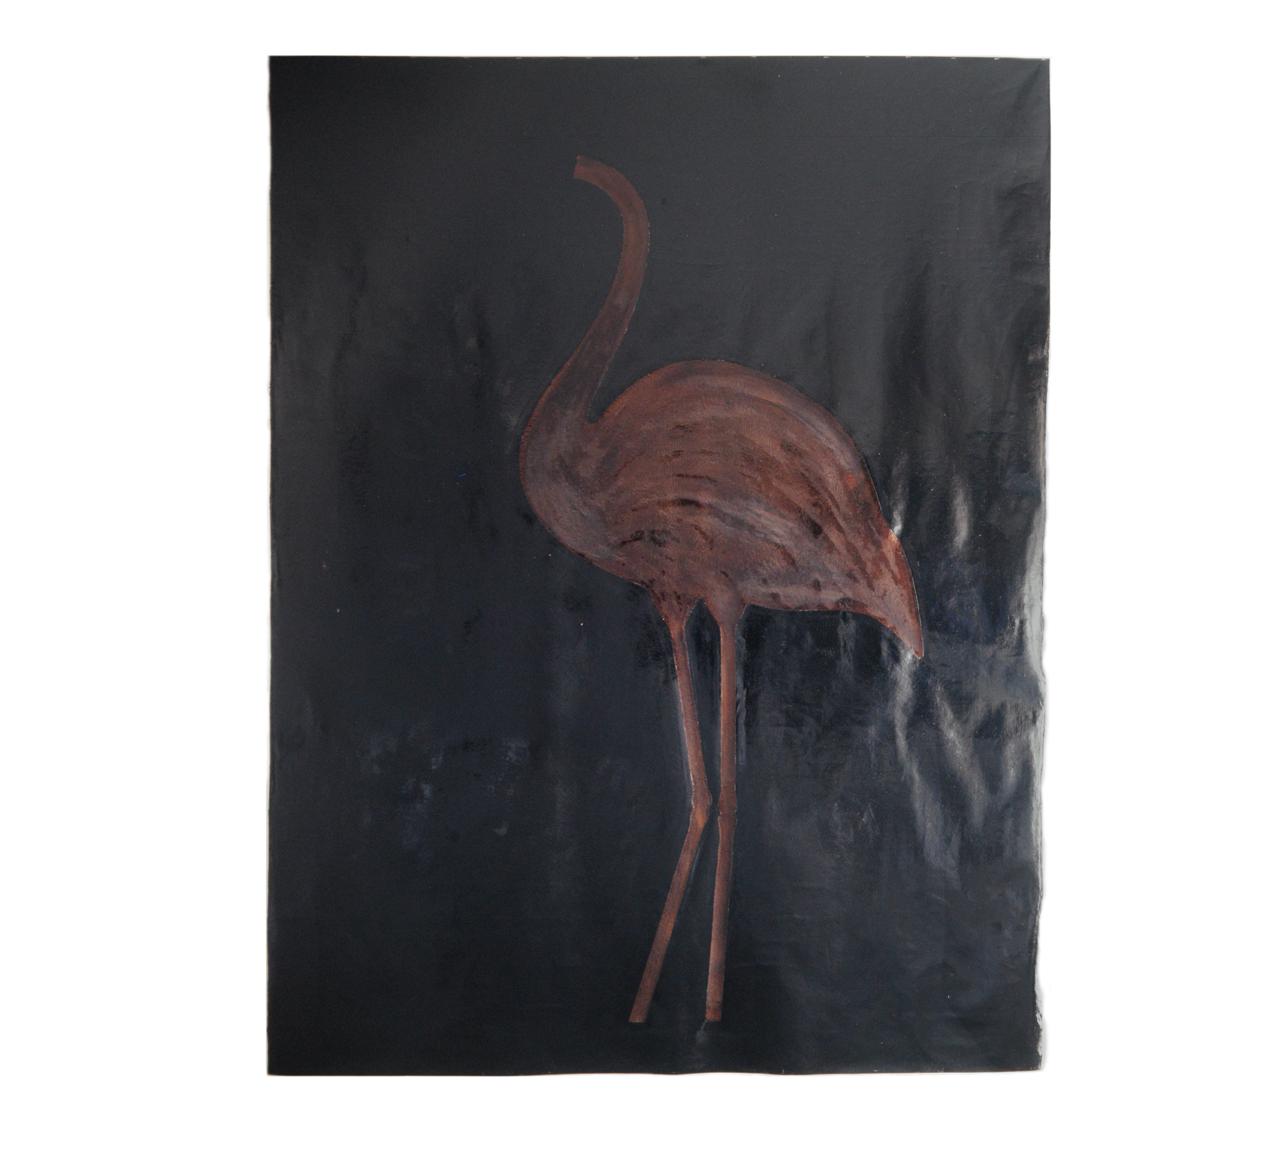 """Flamingobild"" 1981, Teer, Goldbronze auf Leinwand, 275 x 210 cm - Sammlung Don & Nancy Eiler, Madison, Wisconsin - Foto Stephan Hadler"